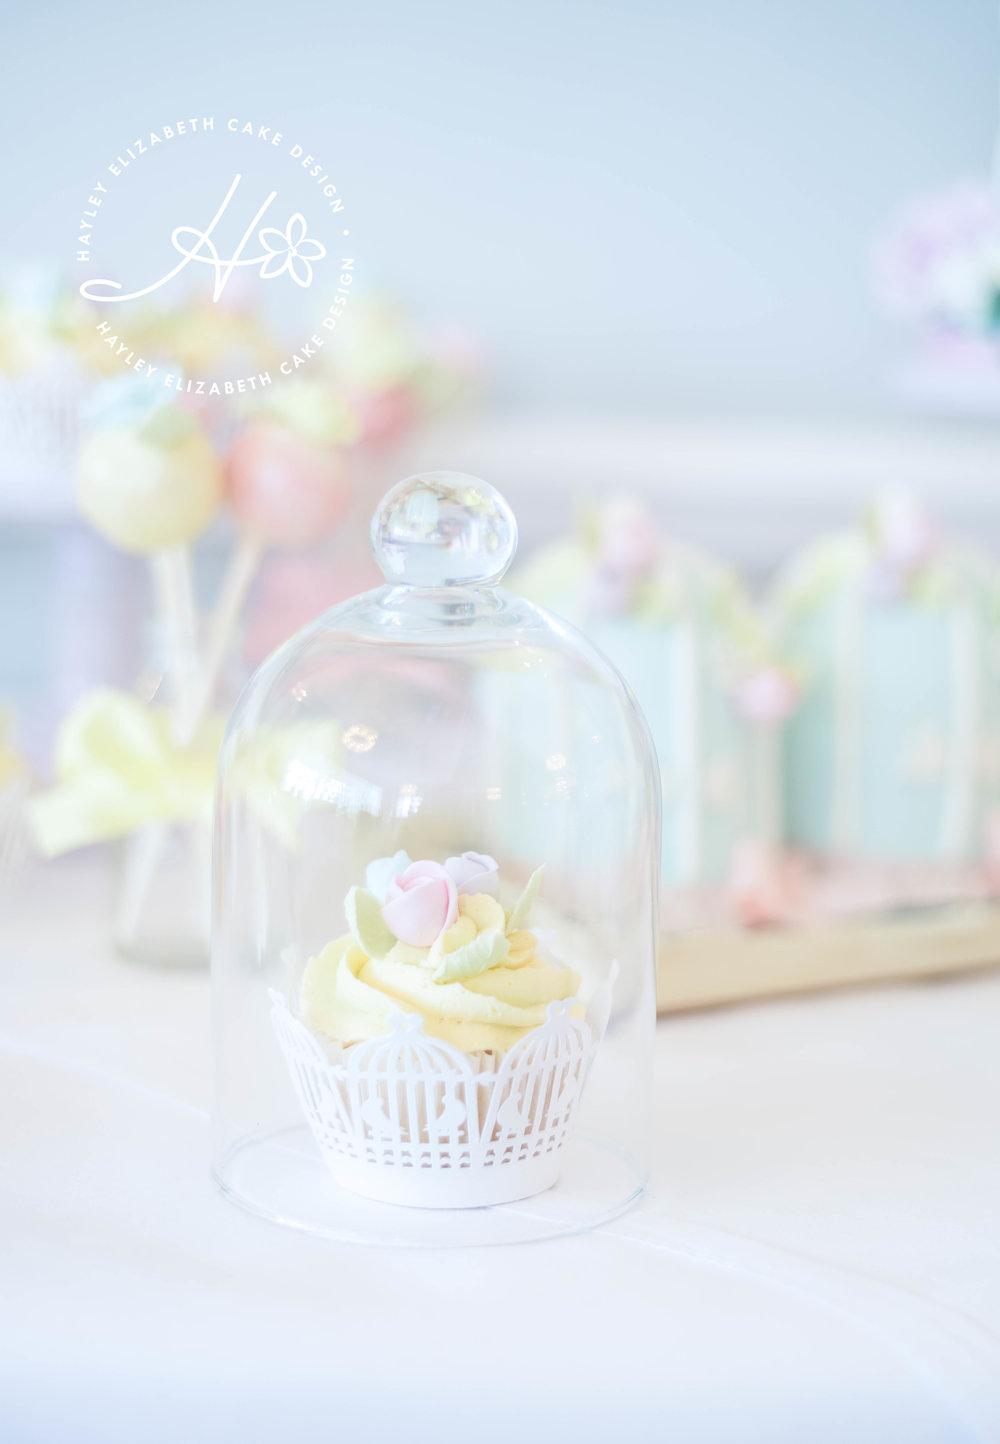 cupcake-closeup.jpg